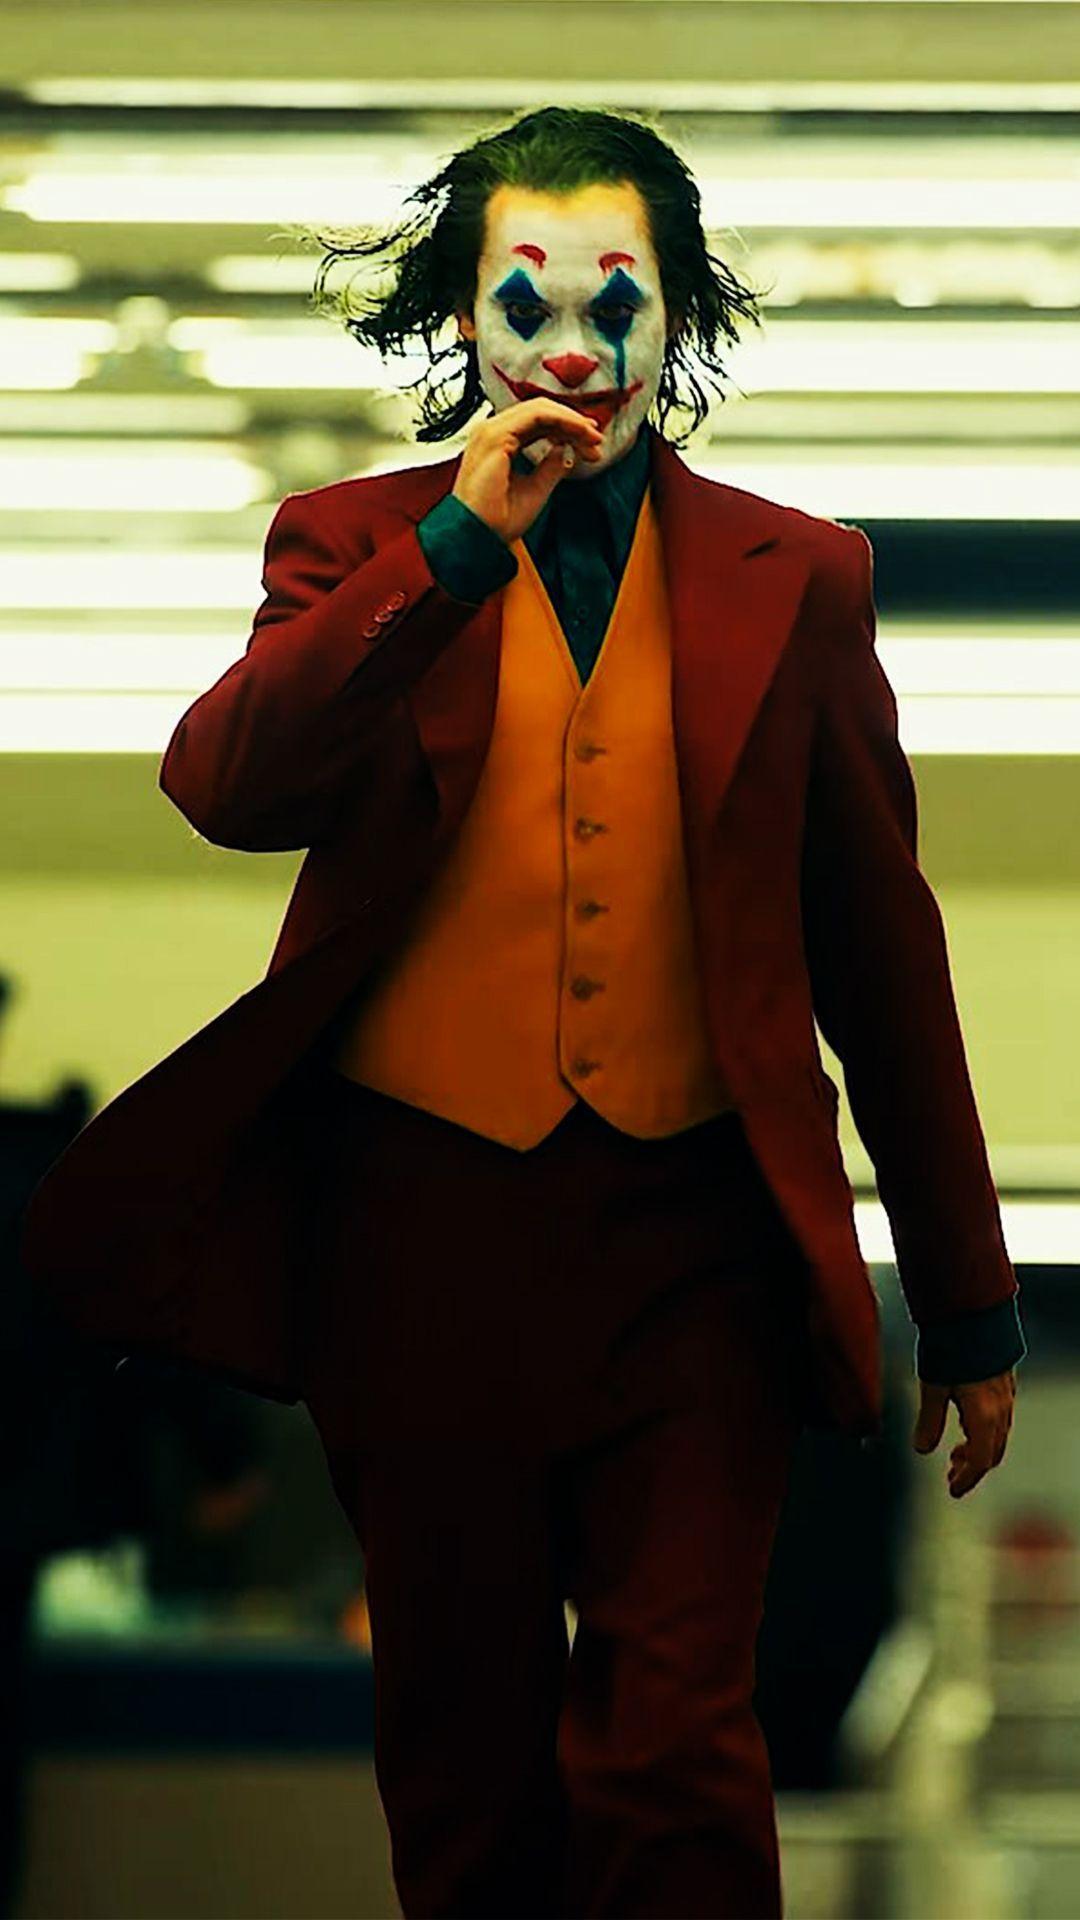 Joaquin Phoenix Joker Photo Joker Joaquin Joker Joaquin Phoenix Batman Joker Wallpaper